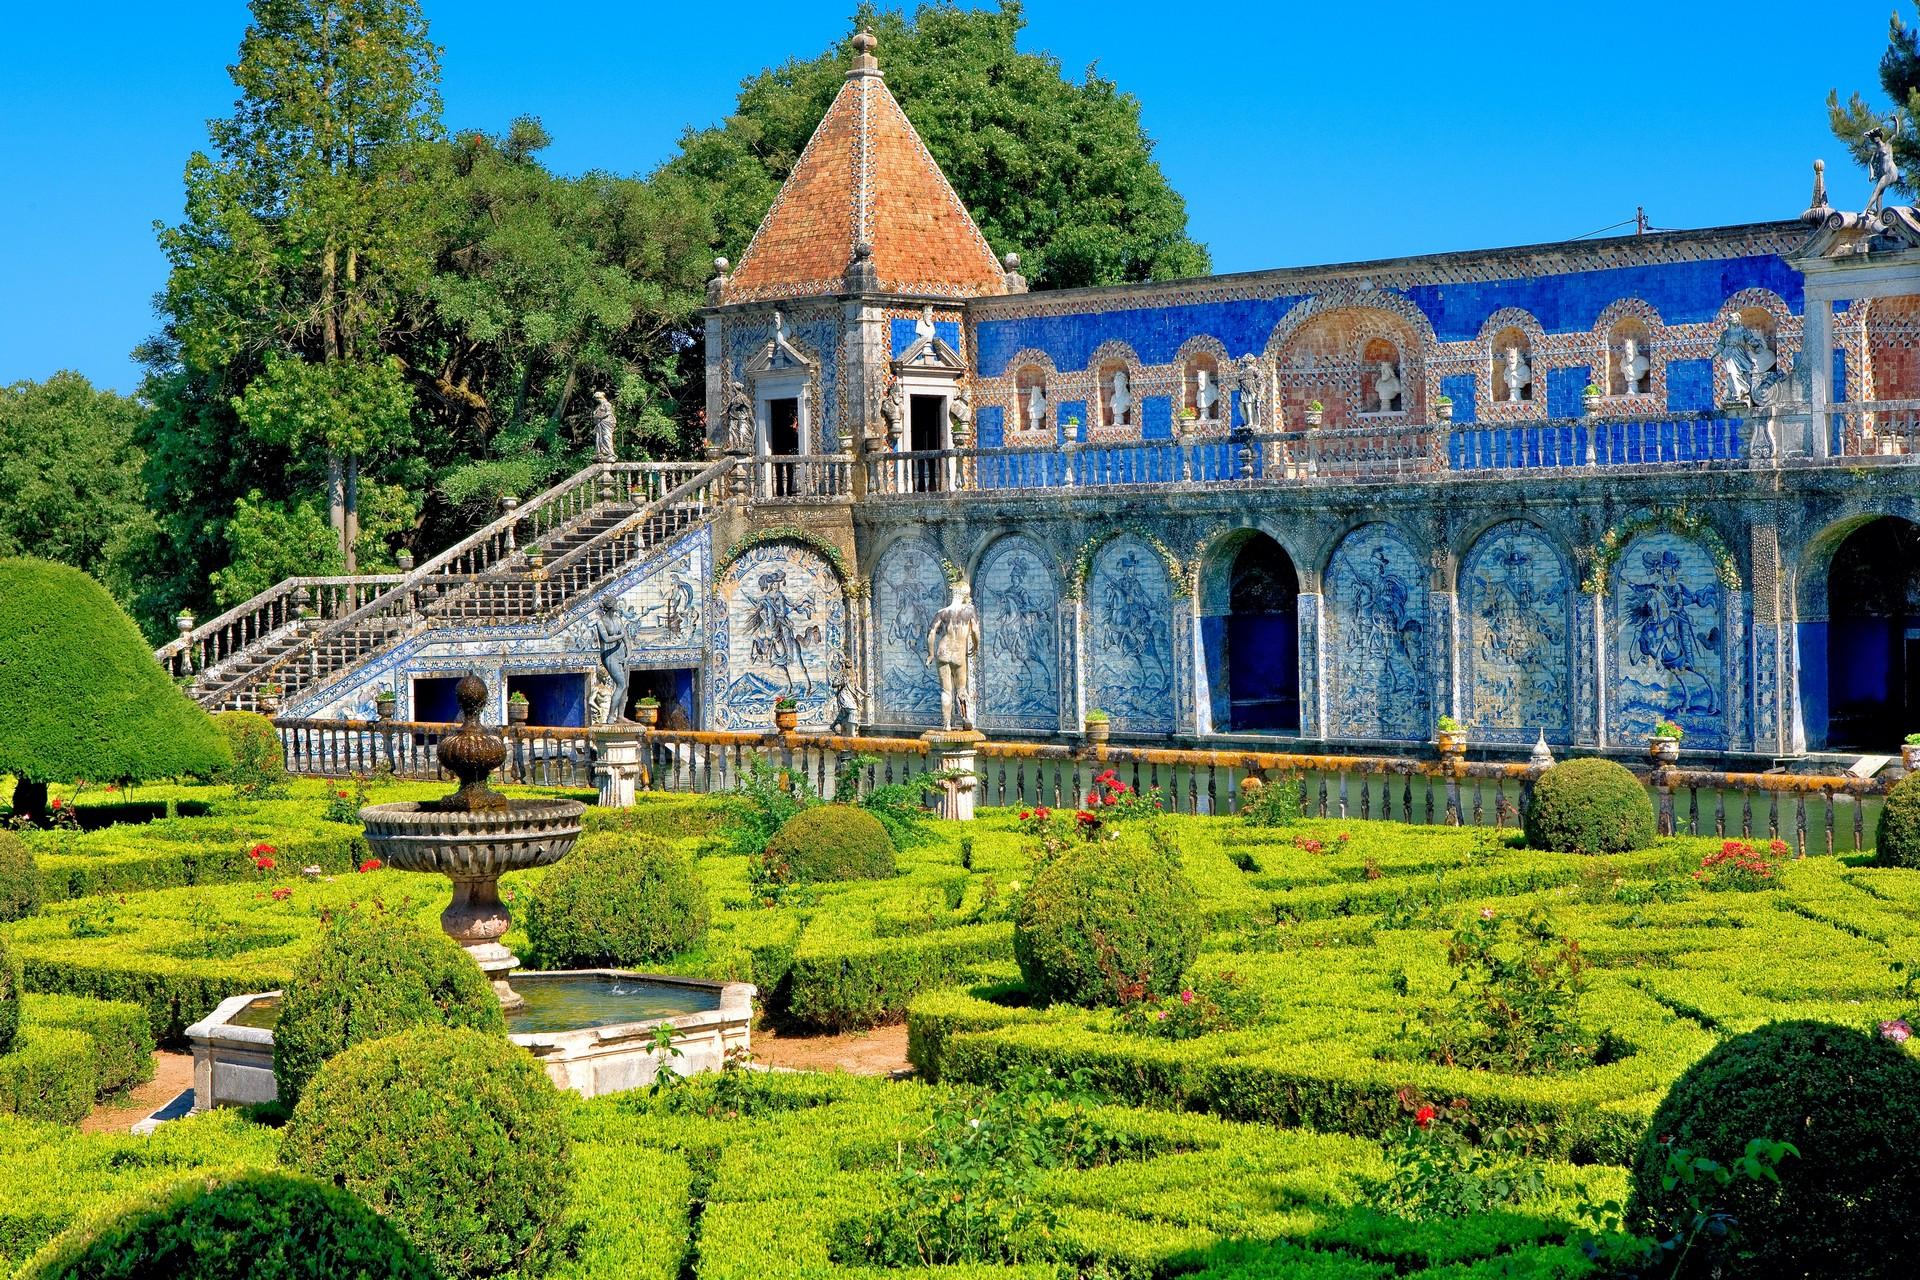 The Best Secret Places From Portugal  secret places The Best Secret Places In Portugal Amazing Secret Places To Discover In Portugal 7